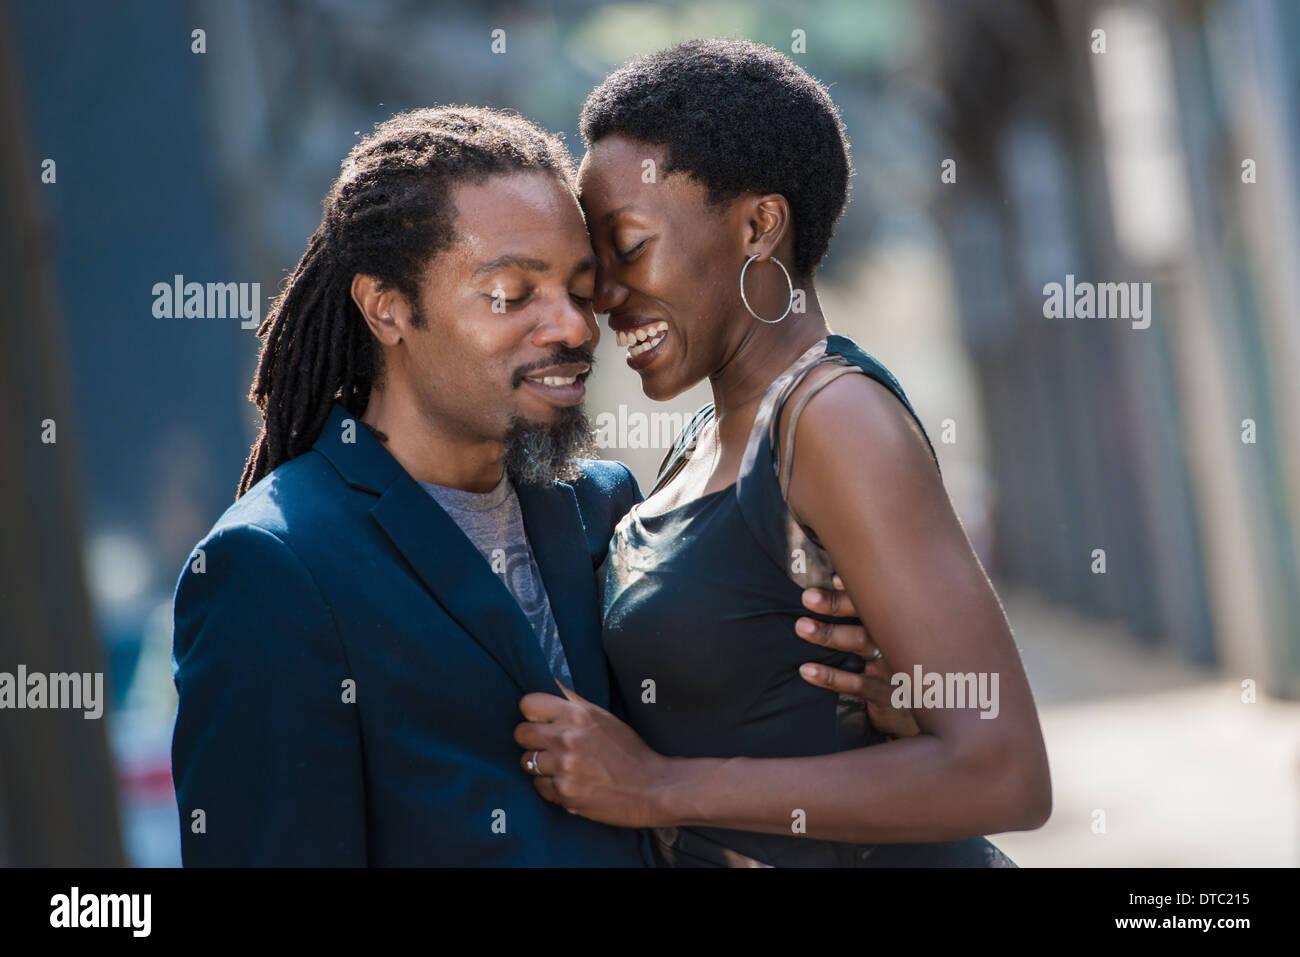 Couple embracing on street Stock Photo